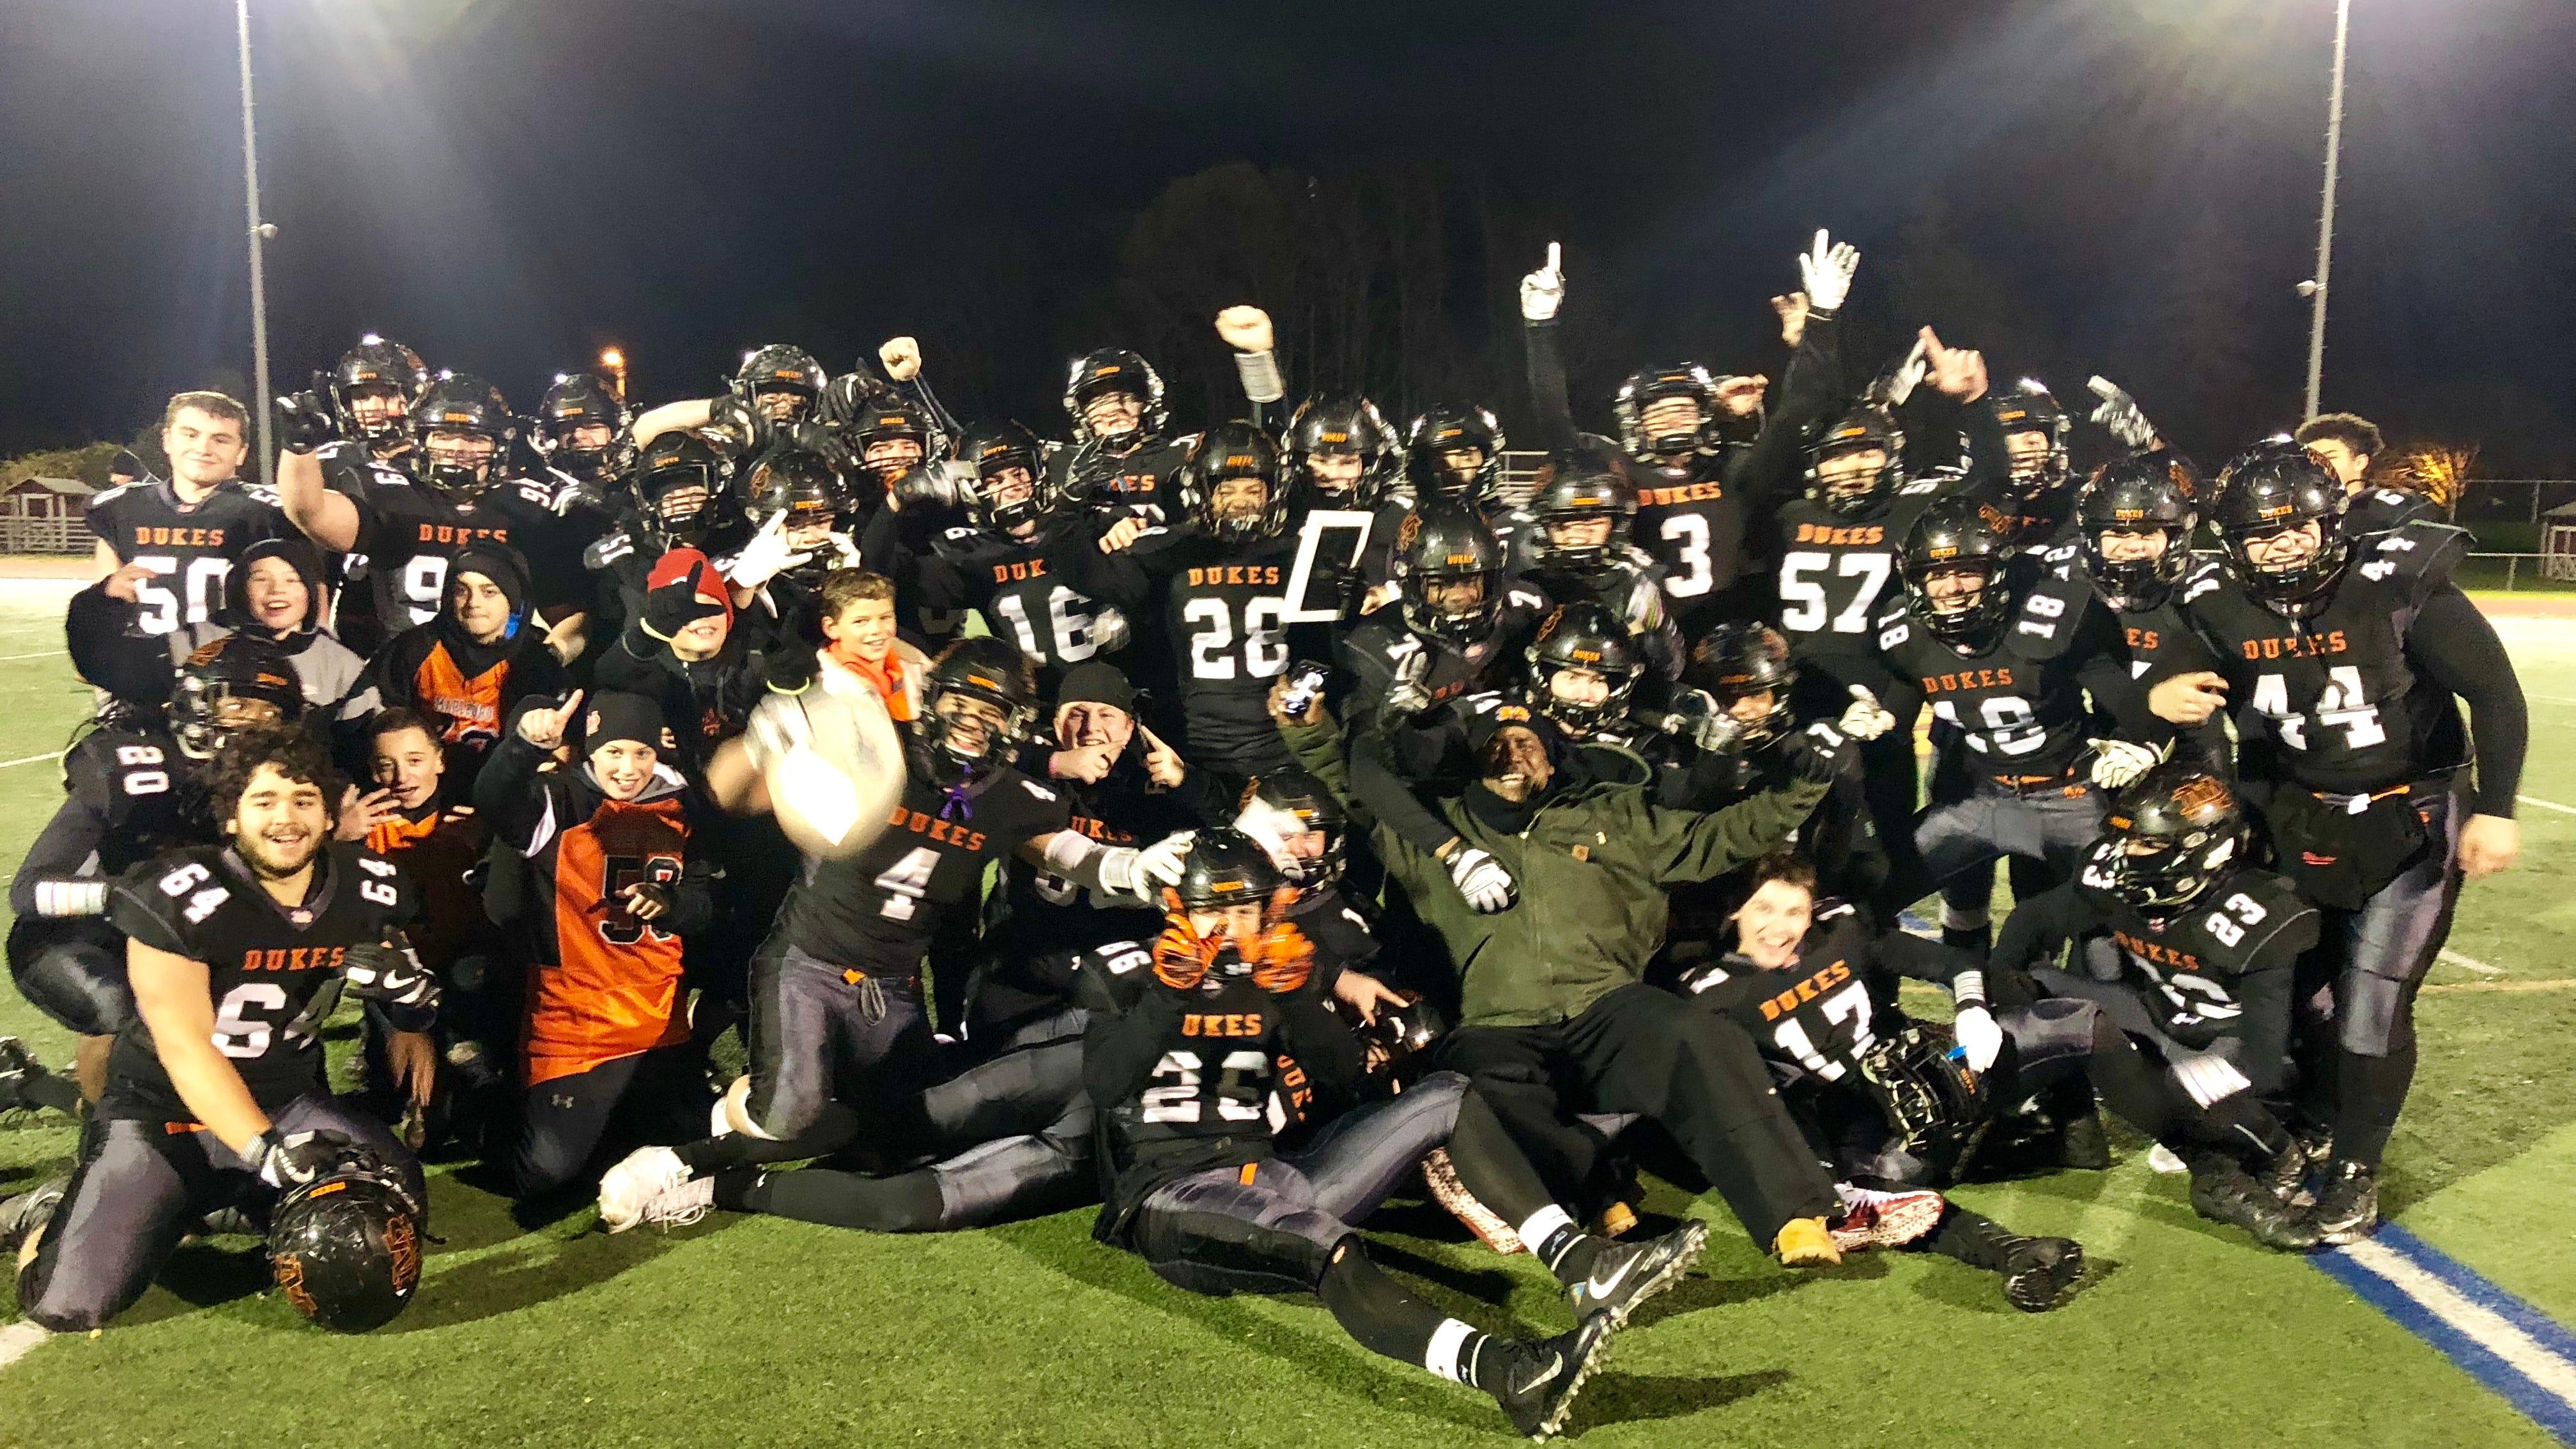 The Marlboro football team poses after winning the Class B regional title at Dietz Stadium.